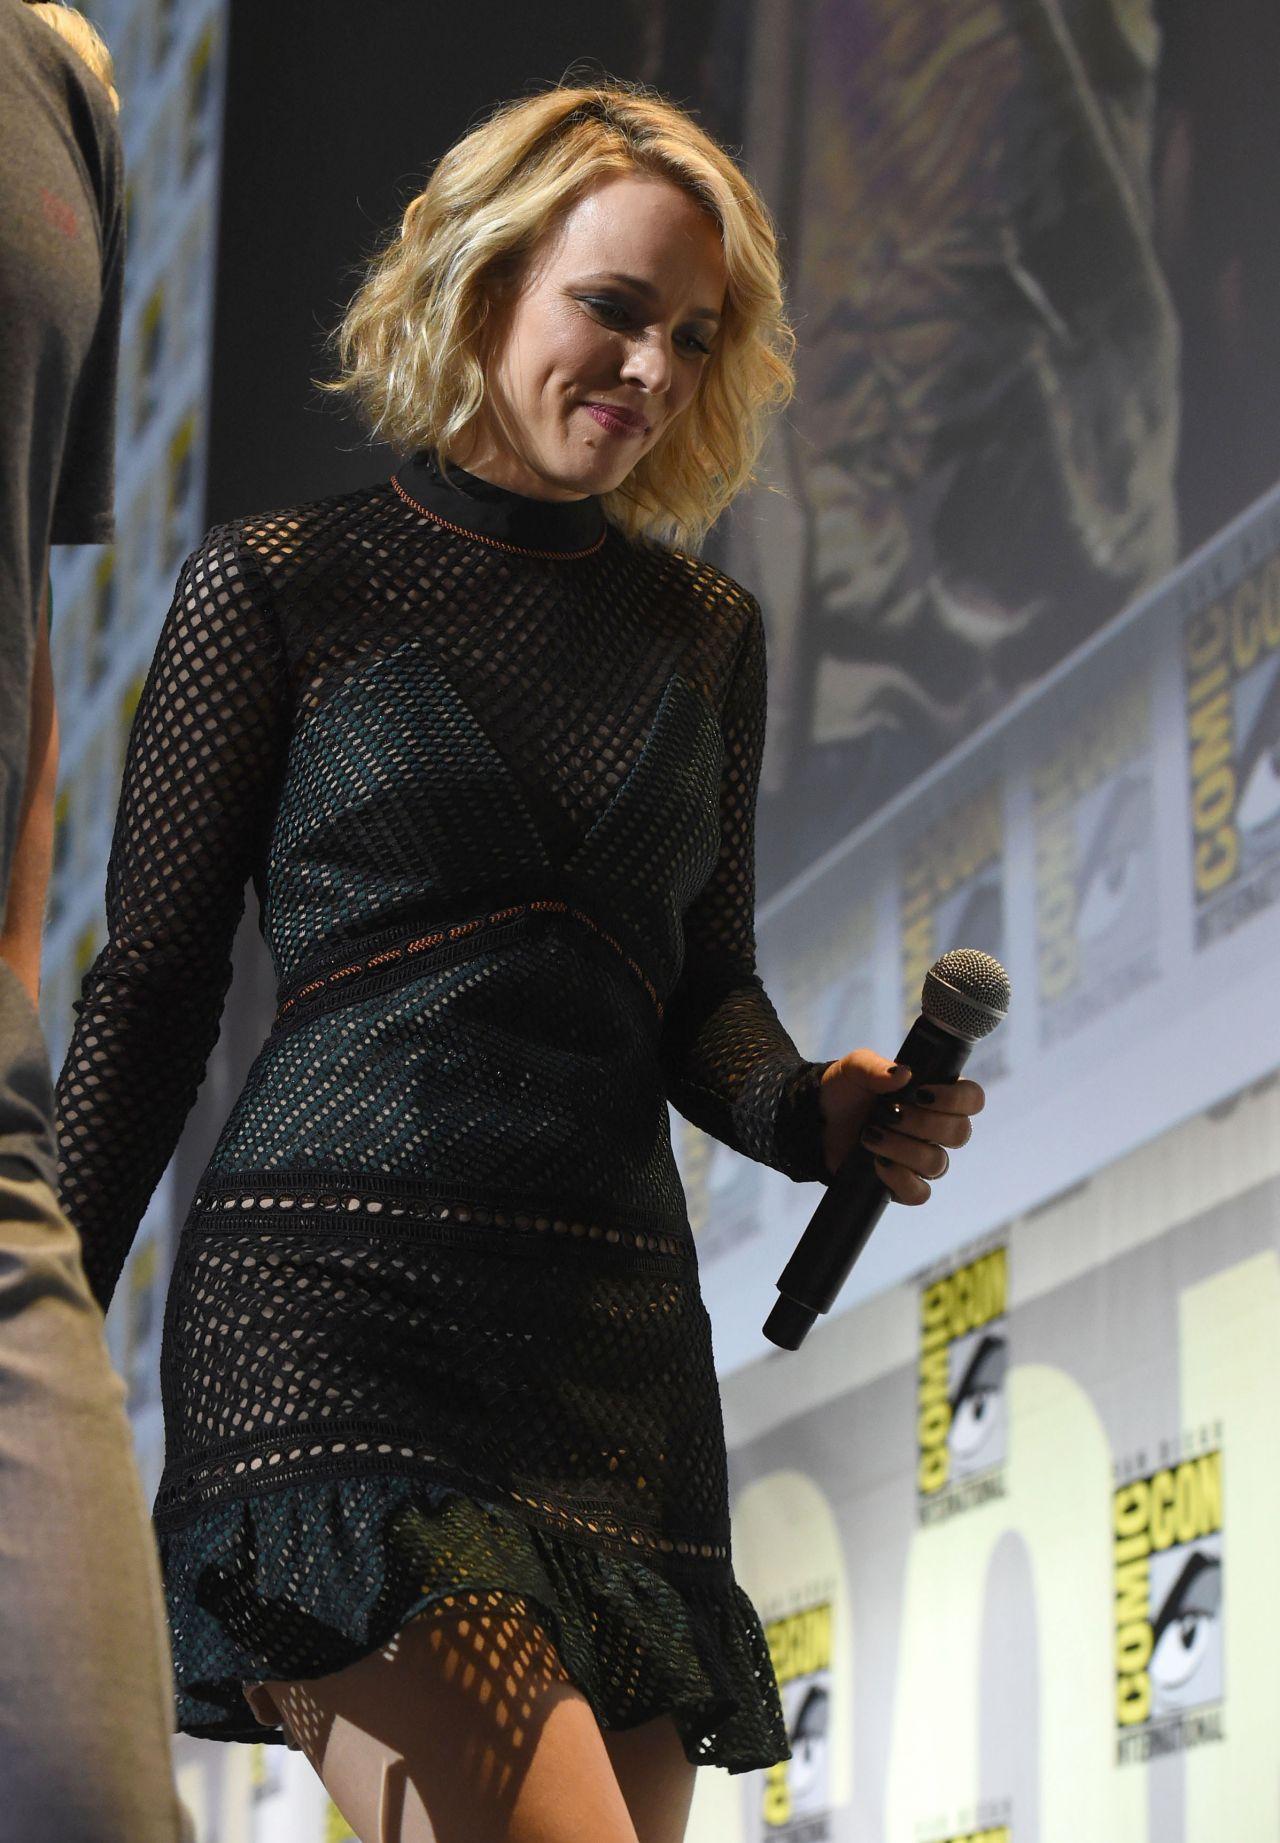 Rachel Mcadams Doctor Strange Press Panel At Comic Con